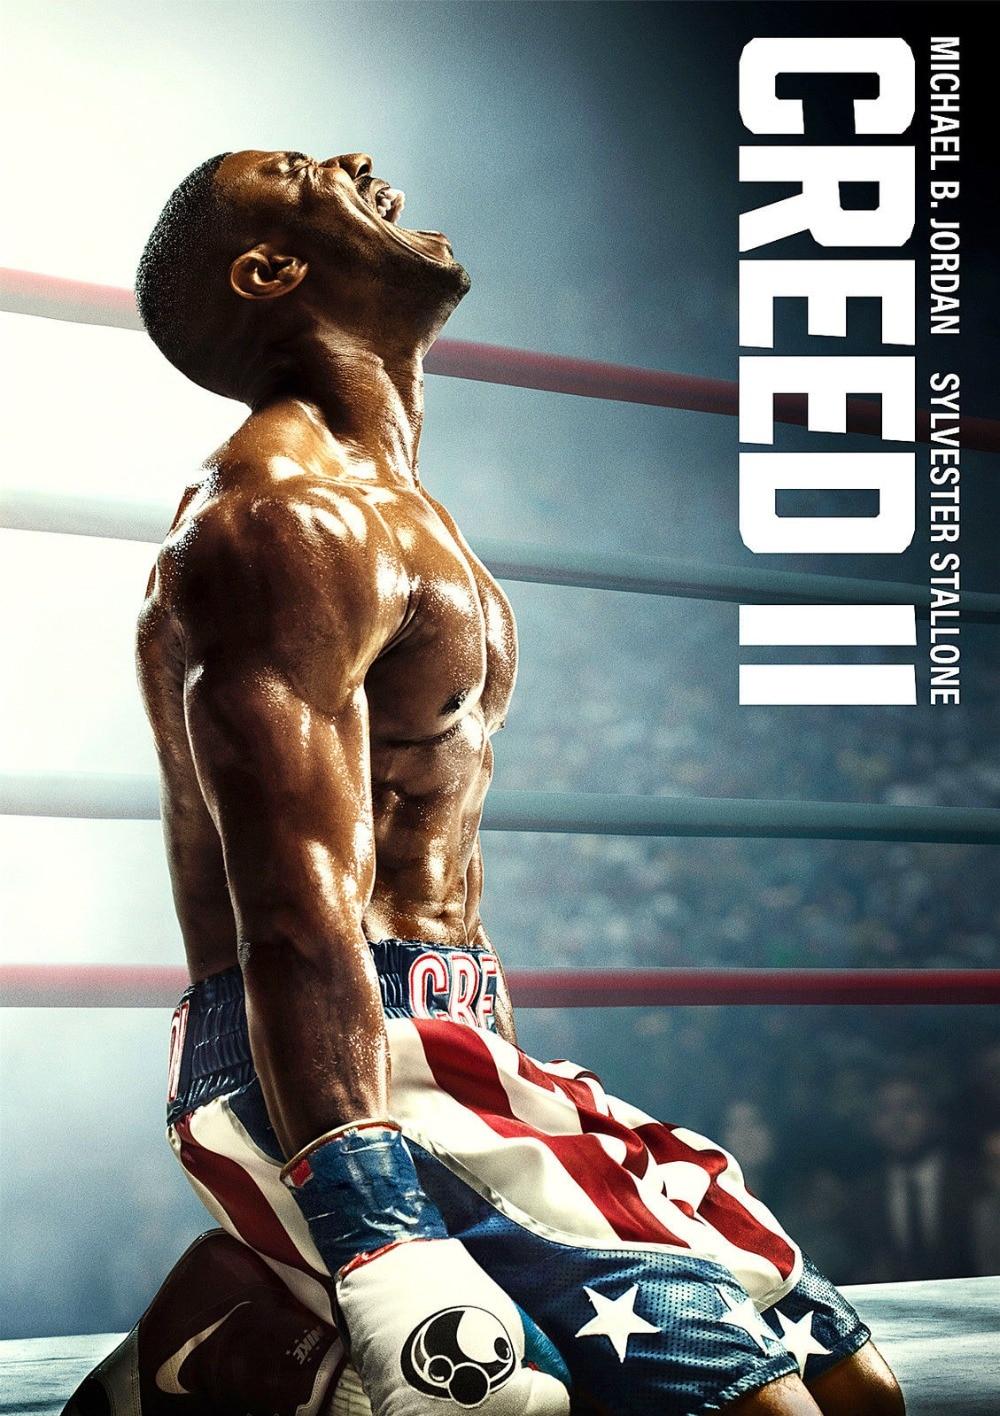 Creed 2 póster, Creed II Rocky, nueva película 2018, Jordan SILK Poster 24x36 pulgadas